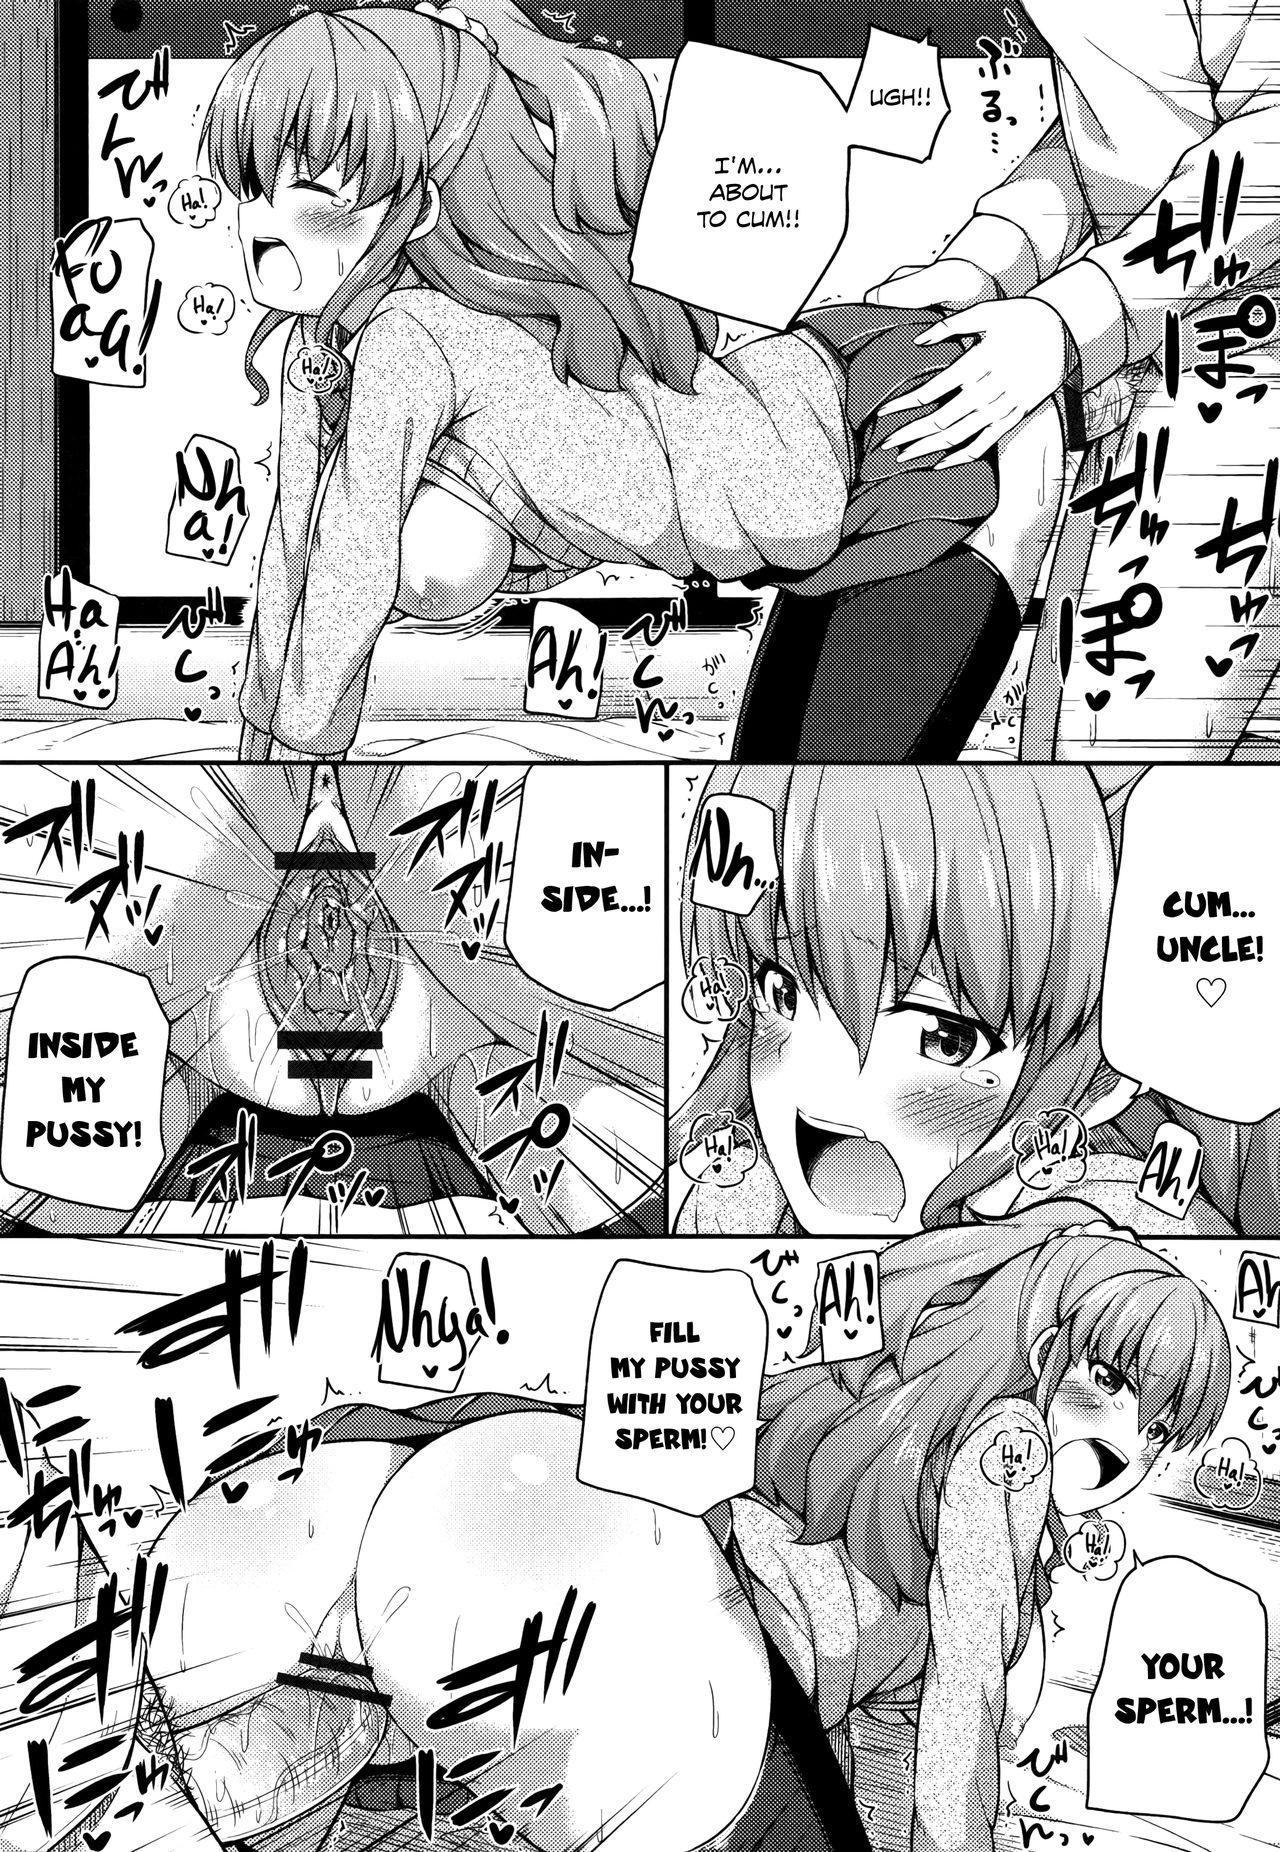 Kimi ga Haramu made Nando mo Aishiteru | I'll love you many times until you get pregnant 90